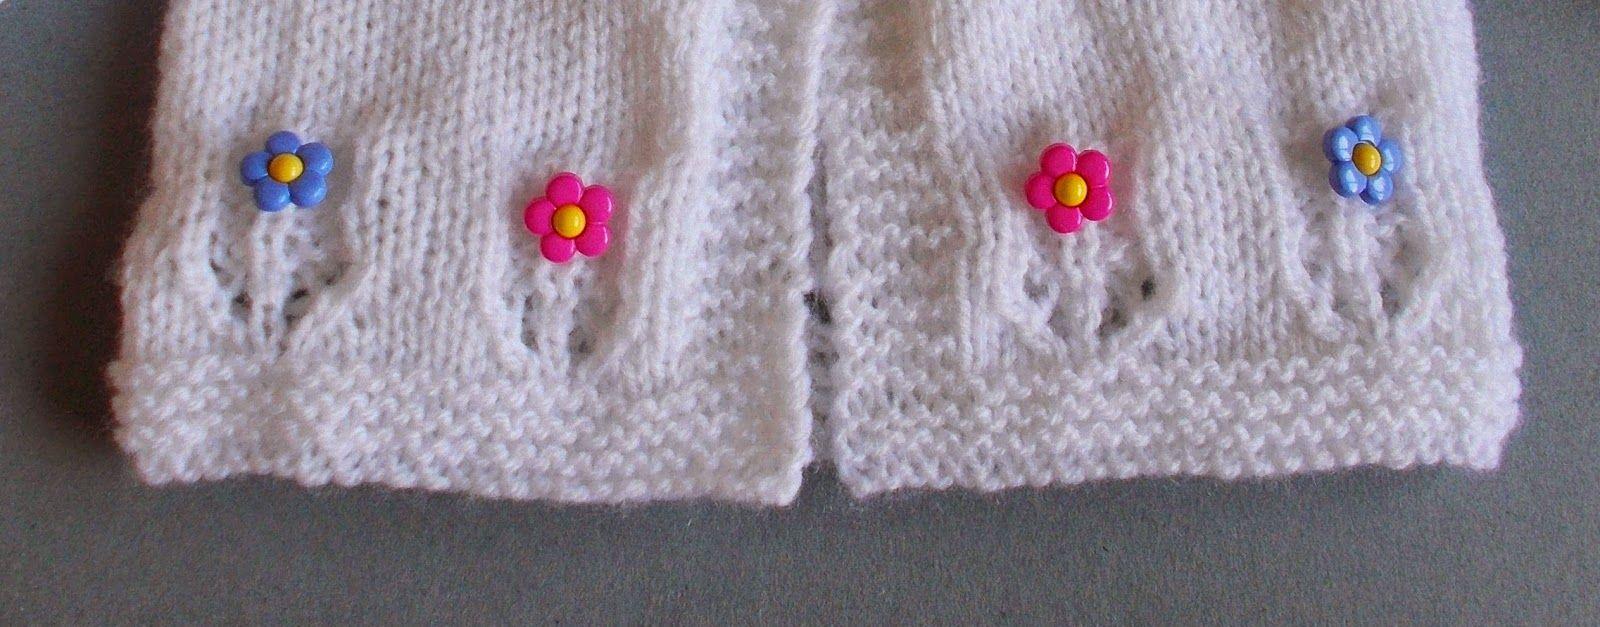 803f6c70215c marianna s lazy daisy days - Fleur Baby Cardigan - free instructions ...